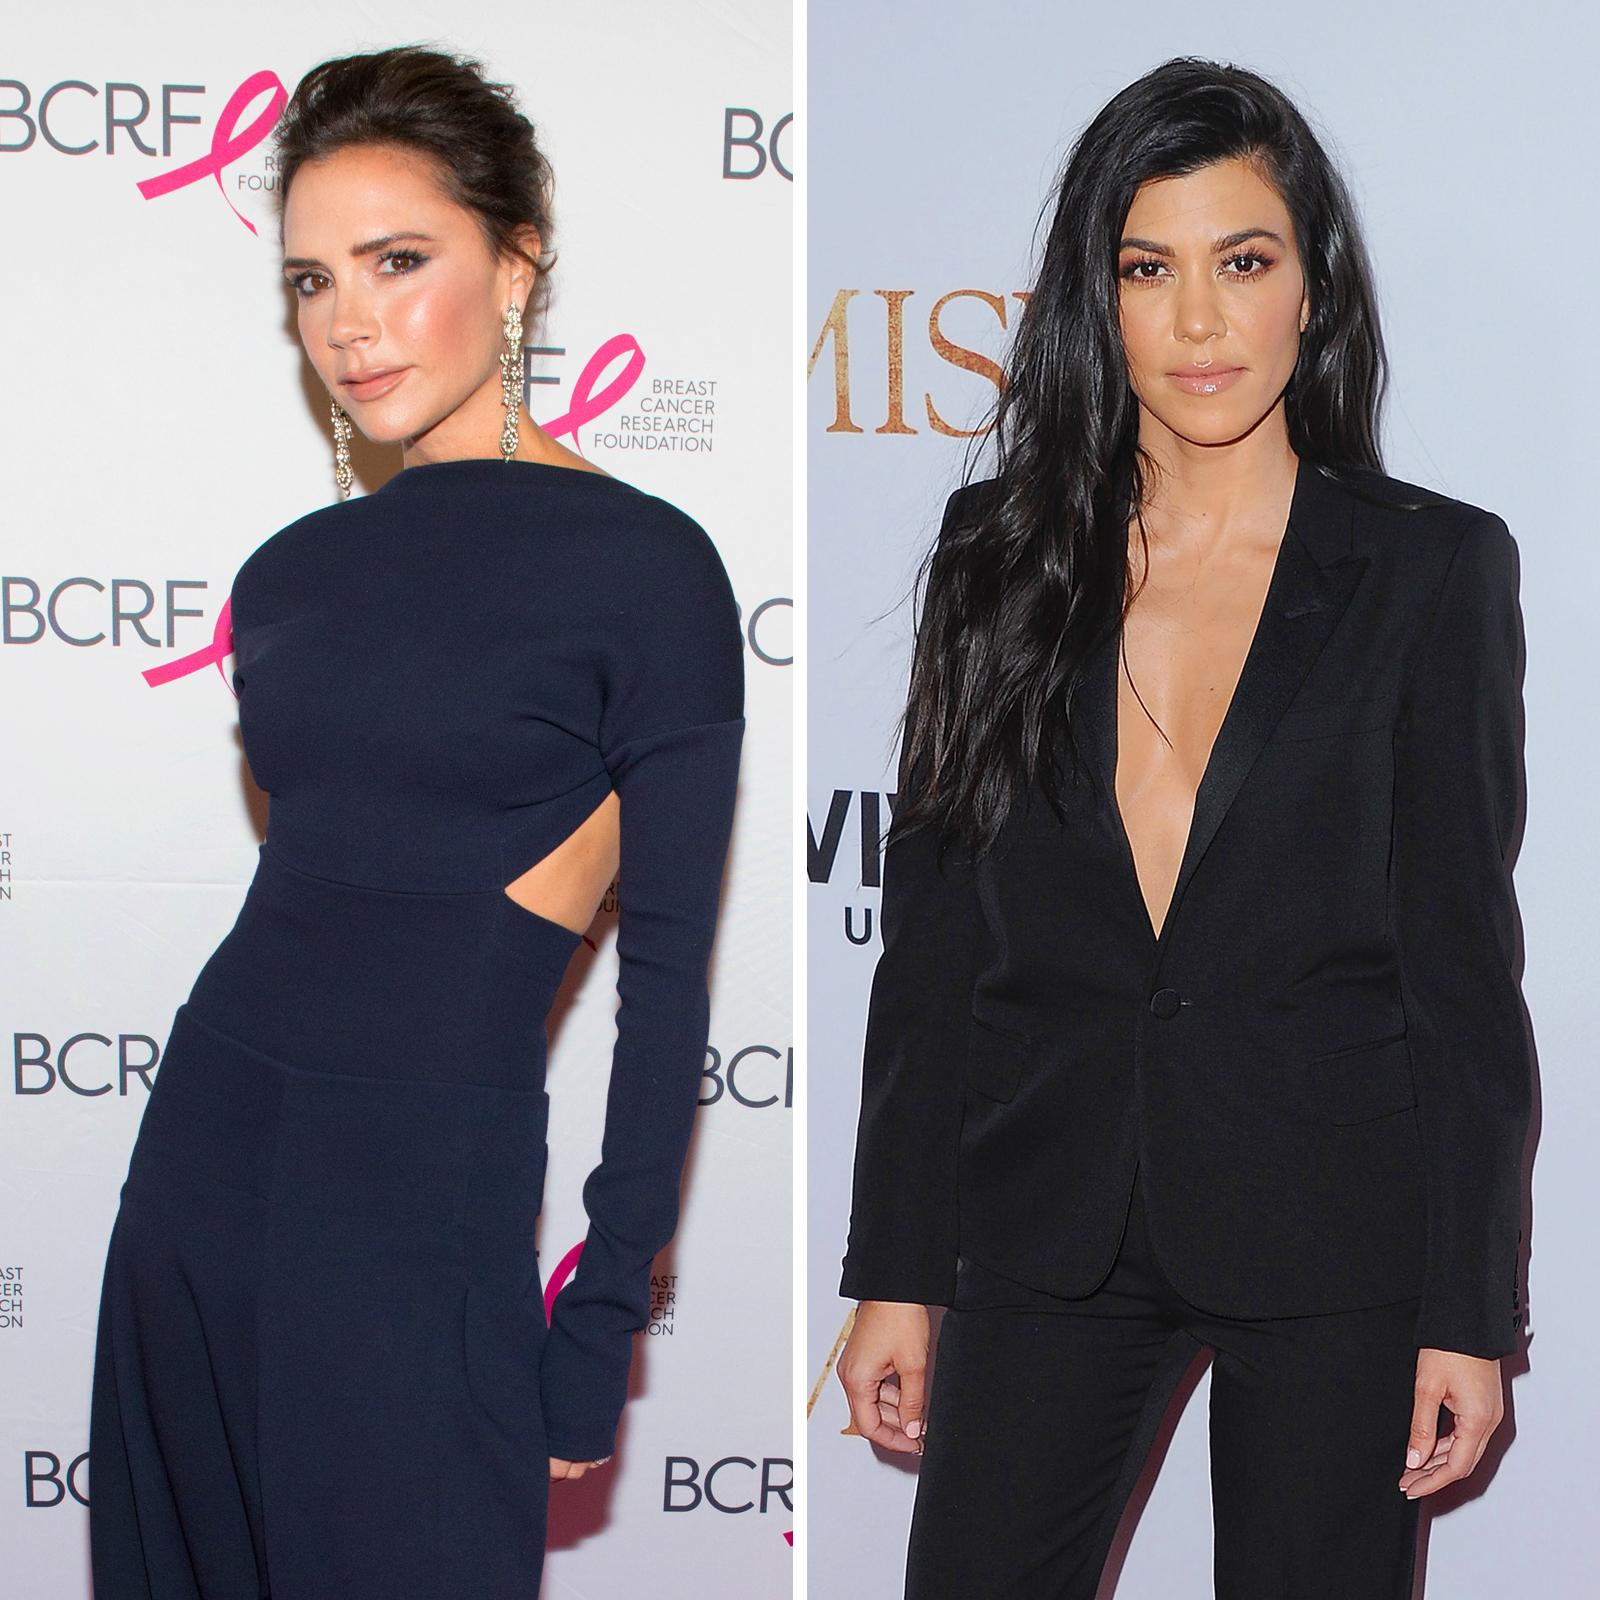 Victoria Beckham y Kourtney Kardashian